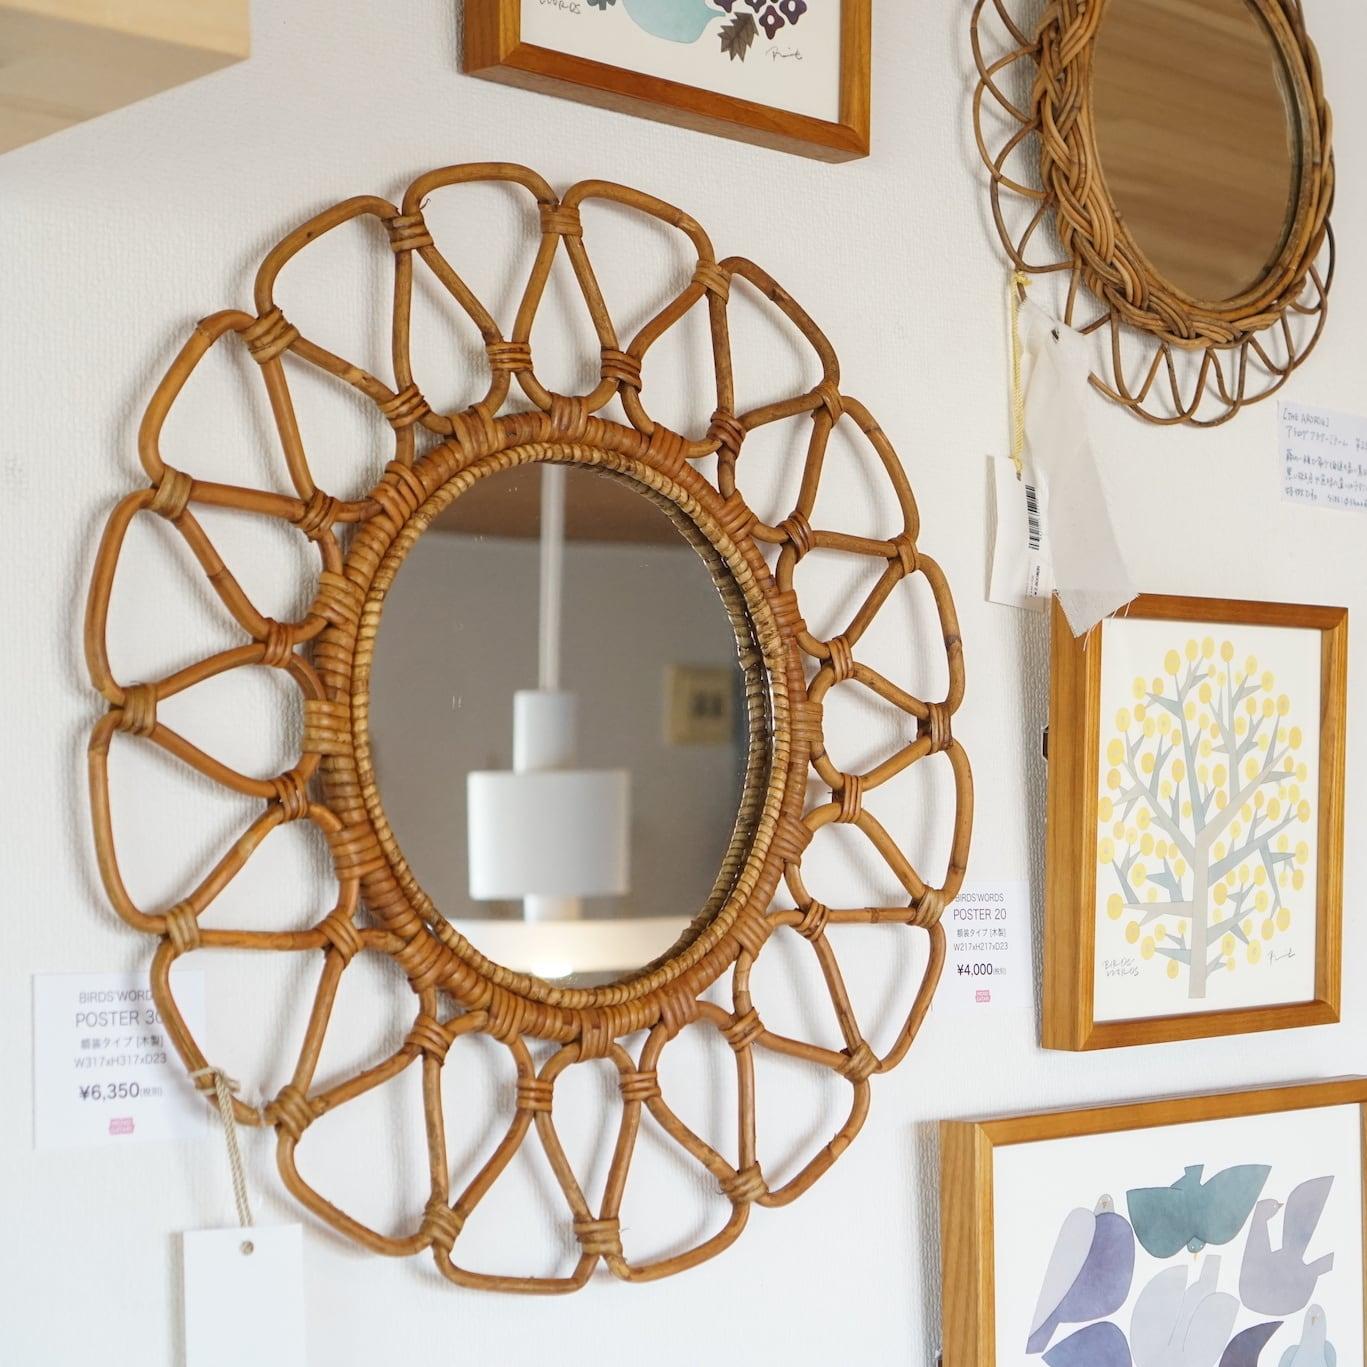 【30%OFF】玄関にぴったりなヴィンテージデザインのミラー。【JUGLAS(ユグラ)】フラワーミラー